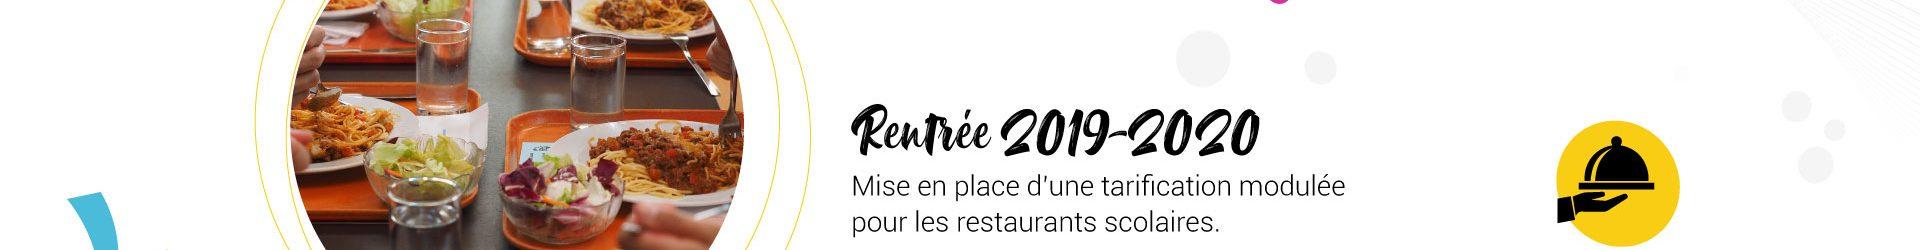 Restauration scolaire 2019-2020